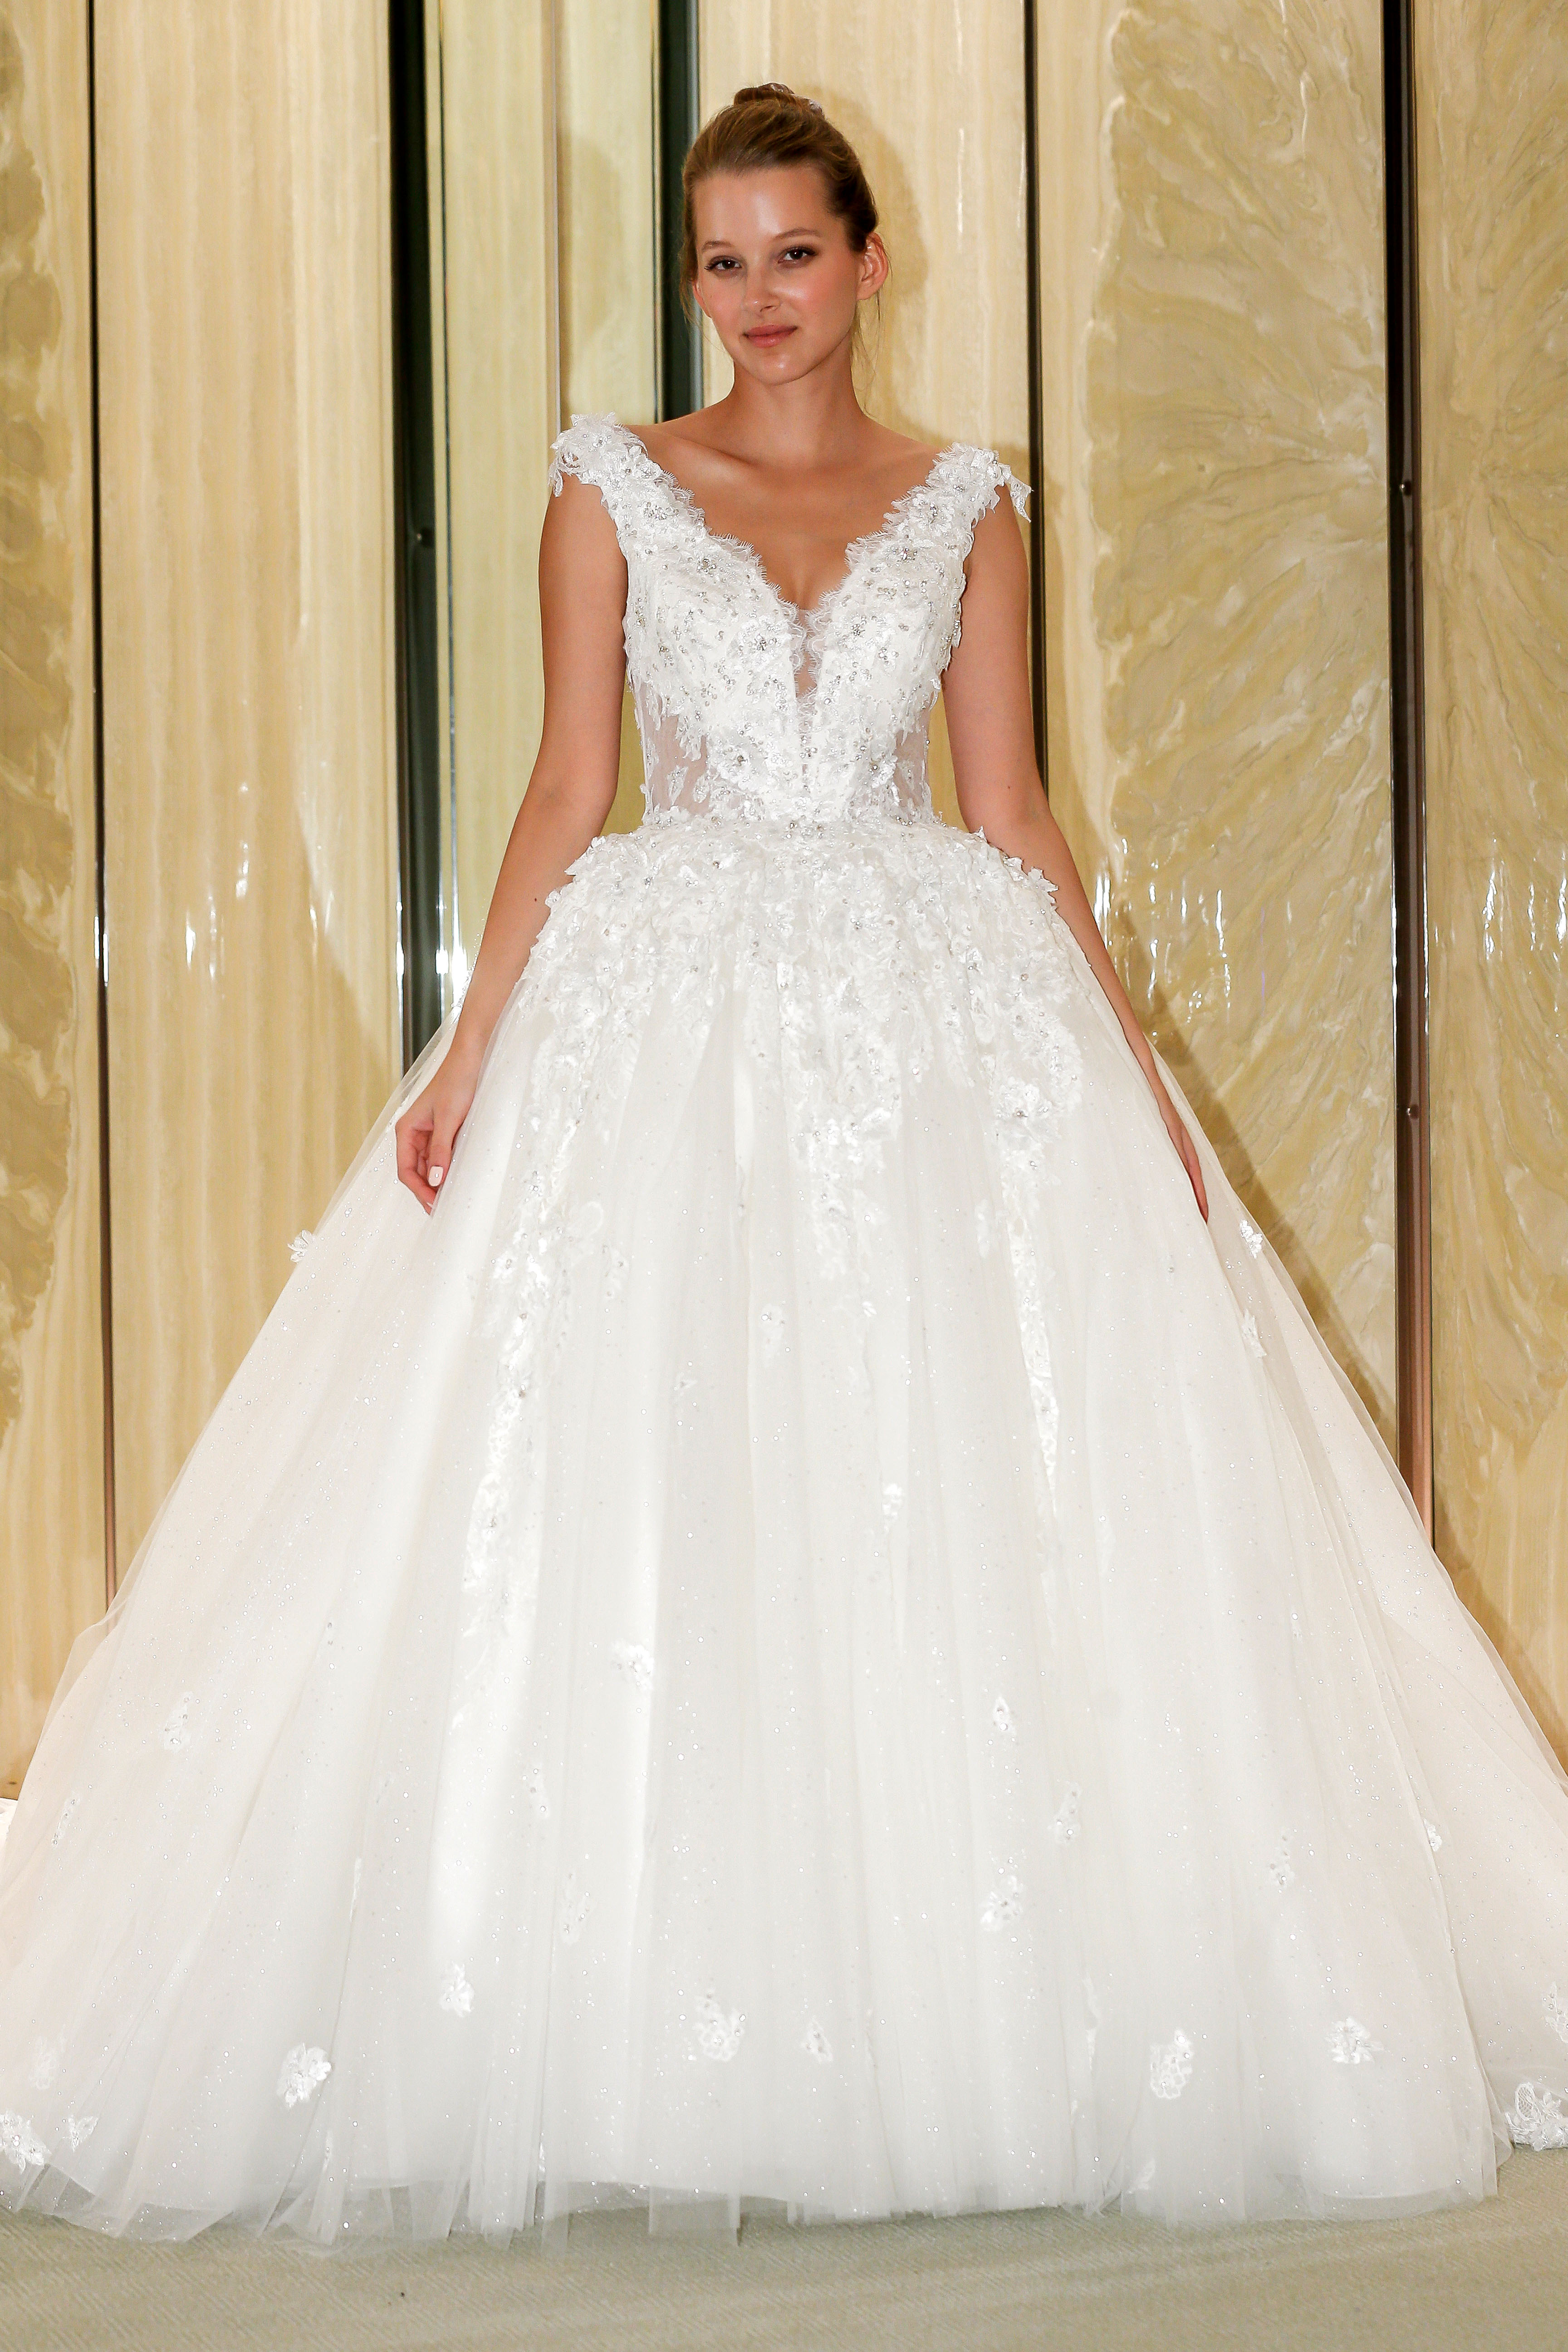 randy fenoli wedding dress v-neck floral applique tulle ball gown